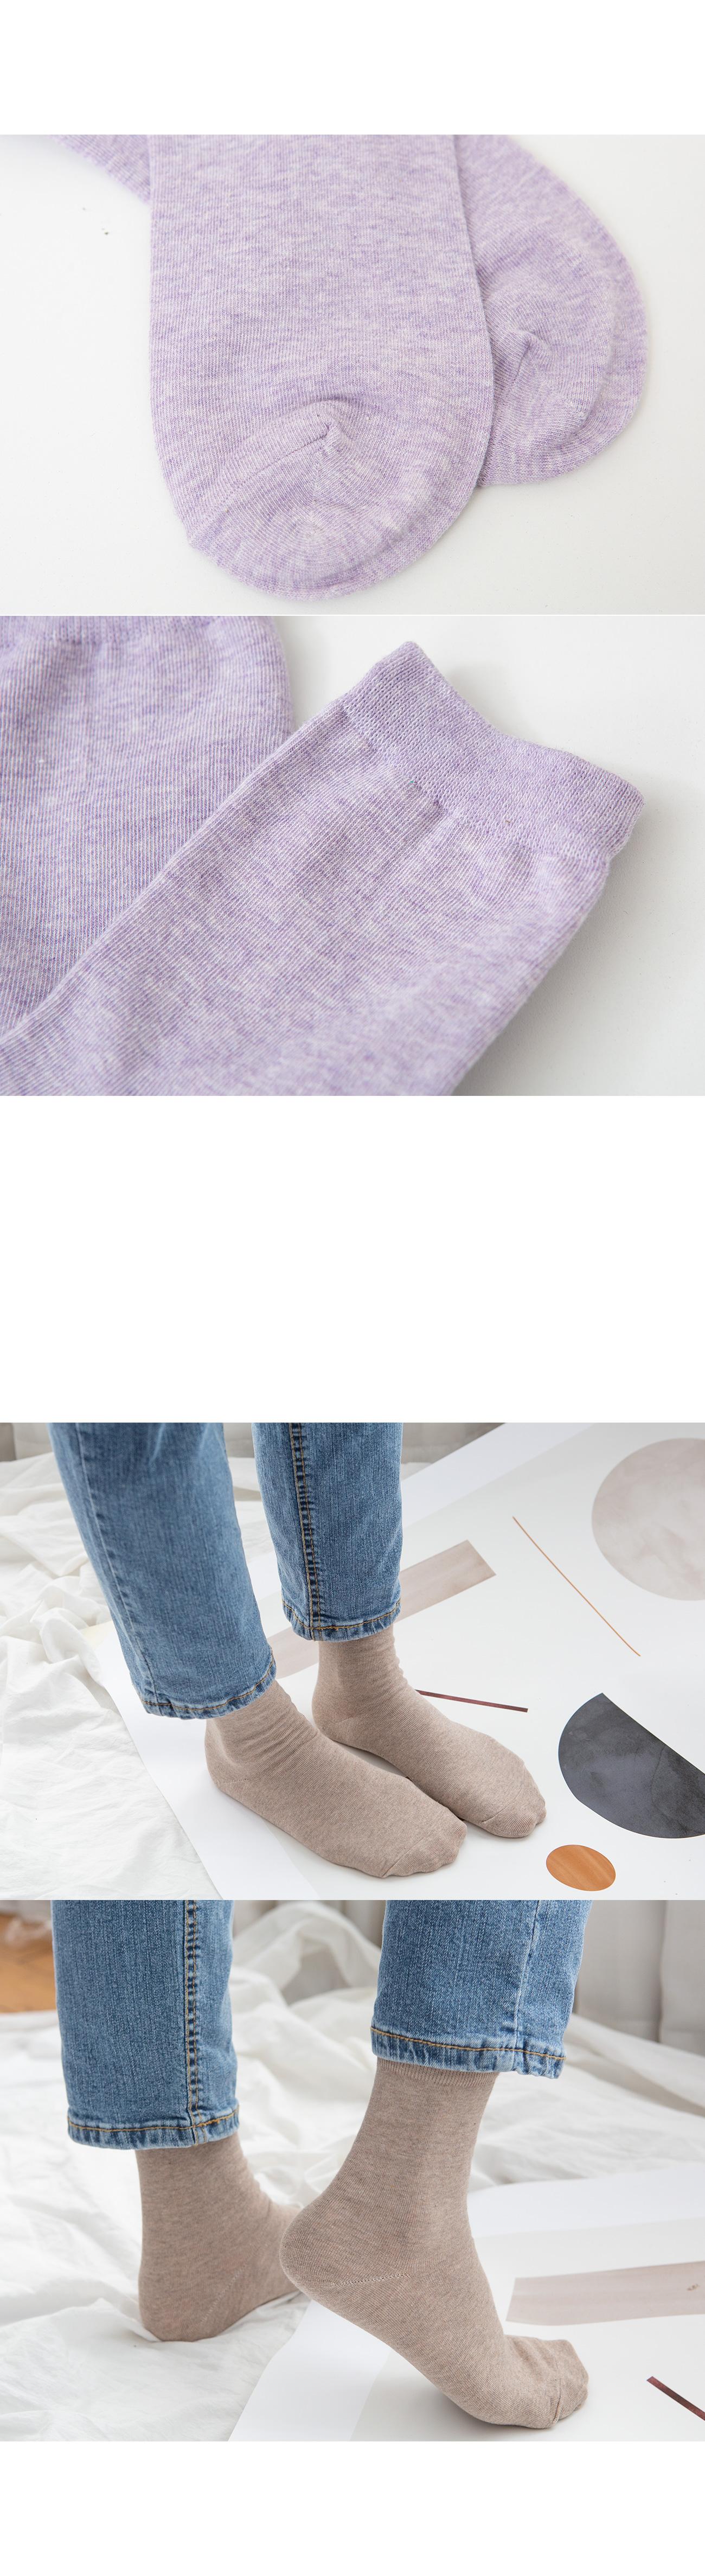 Basic 10 color socks #86096